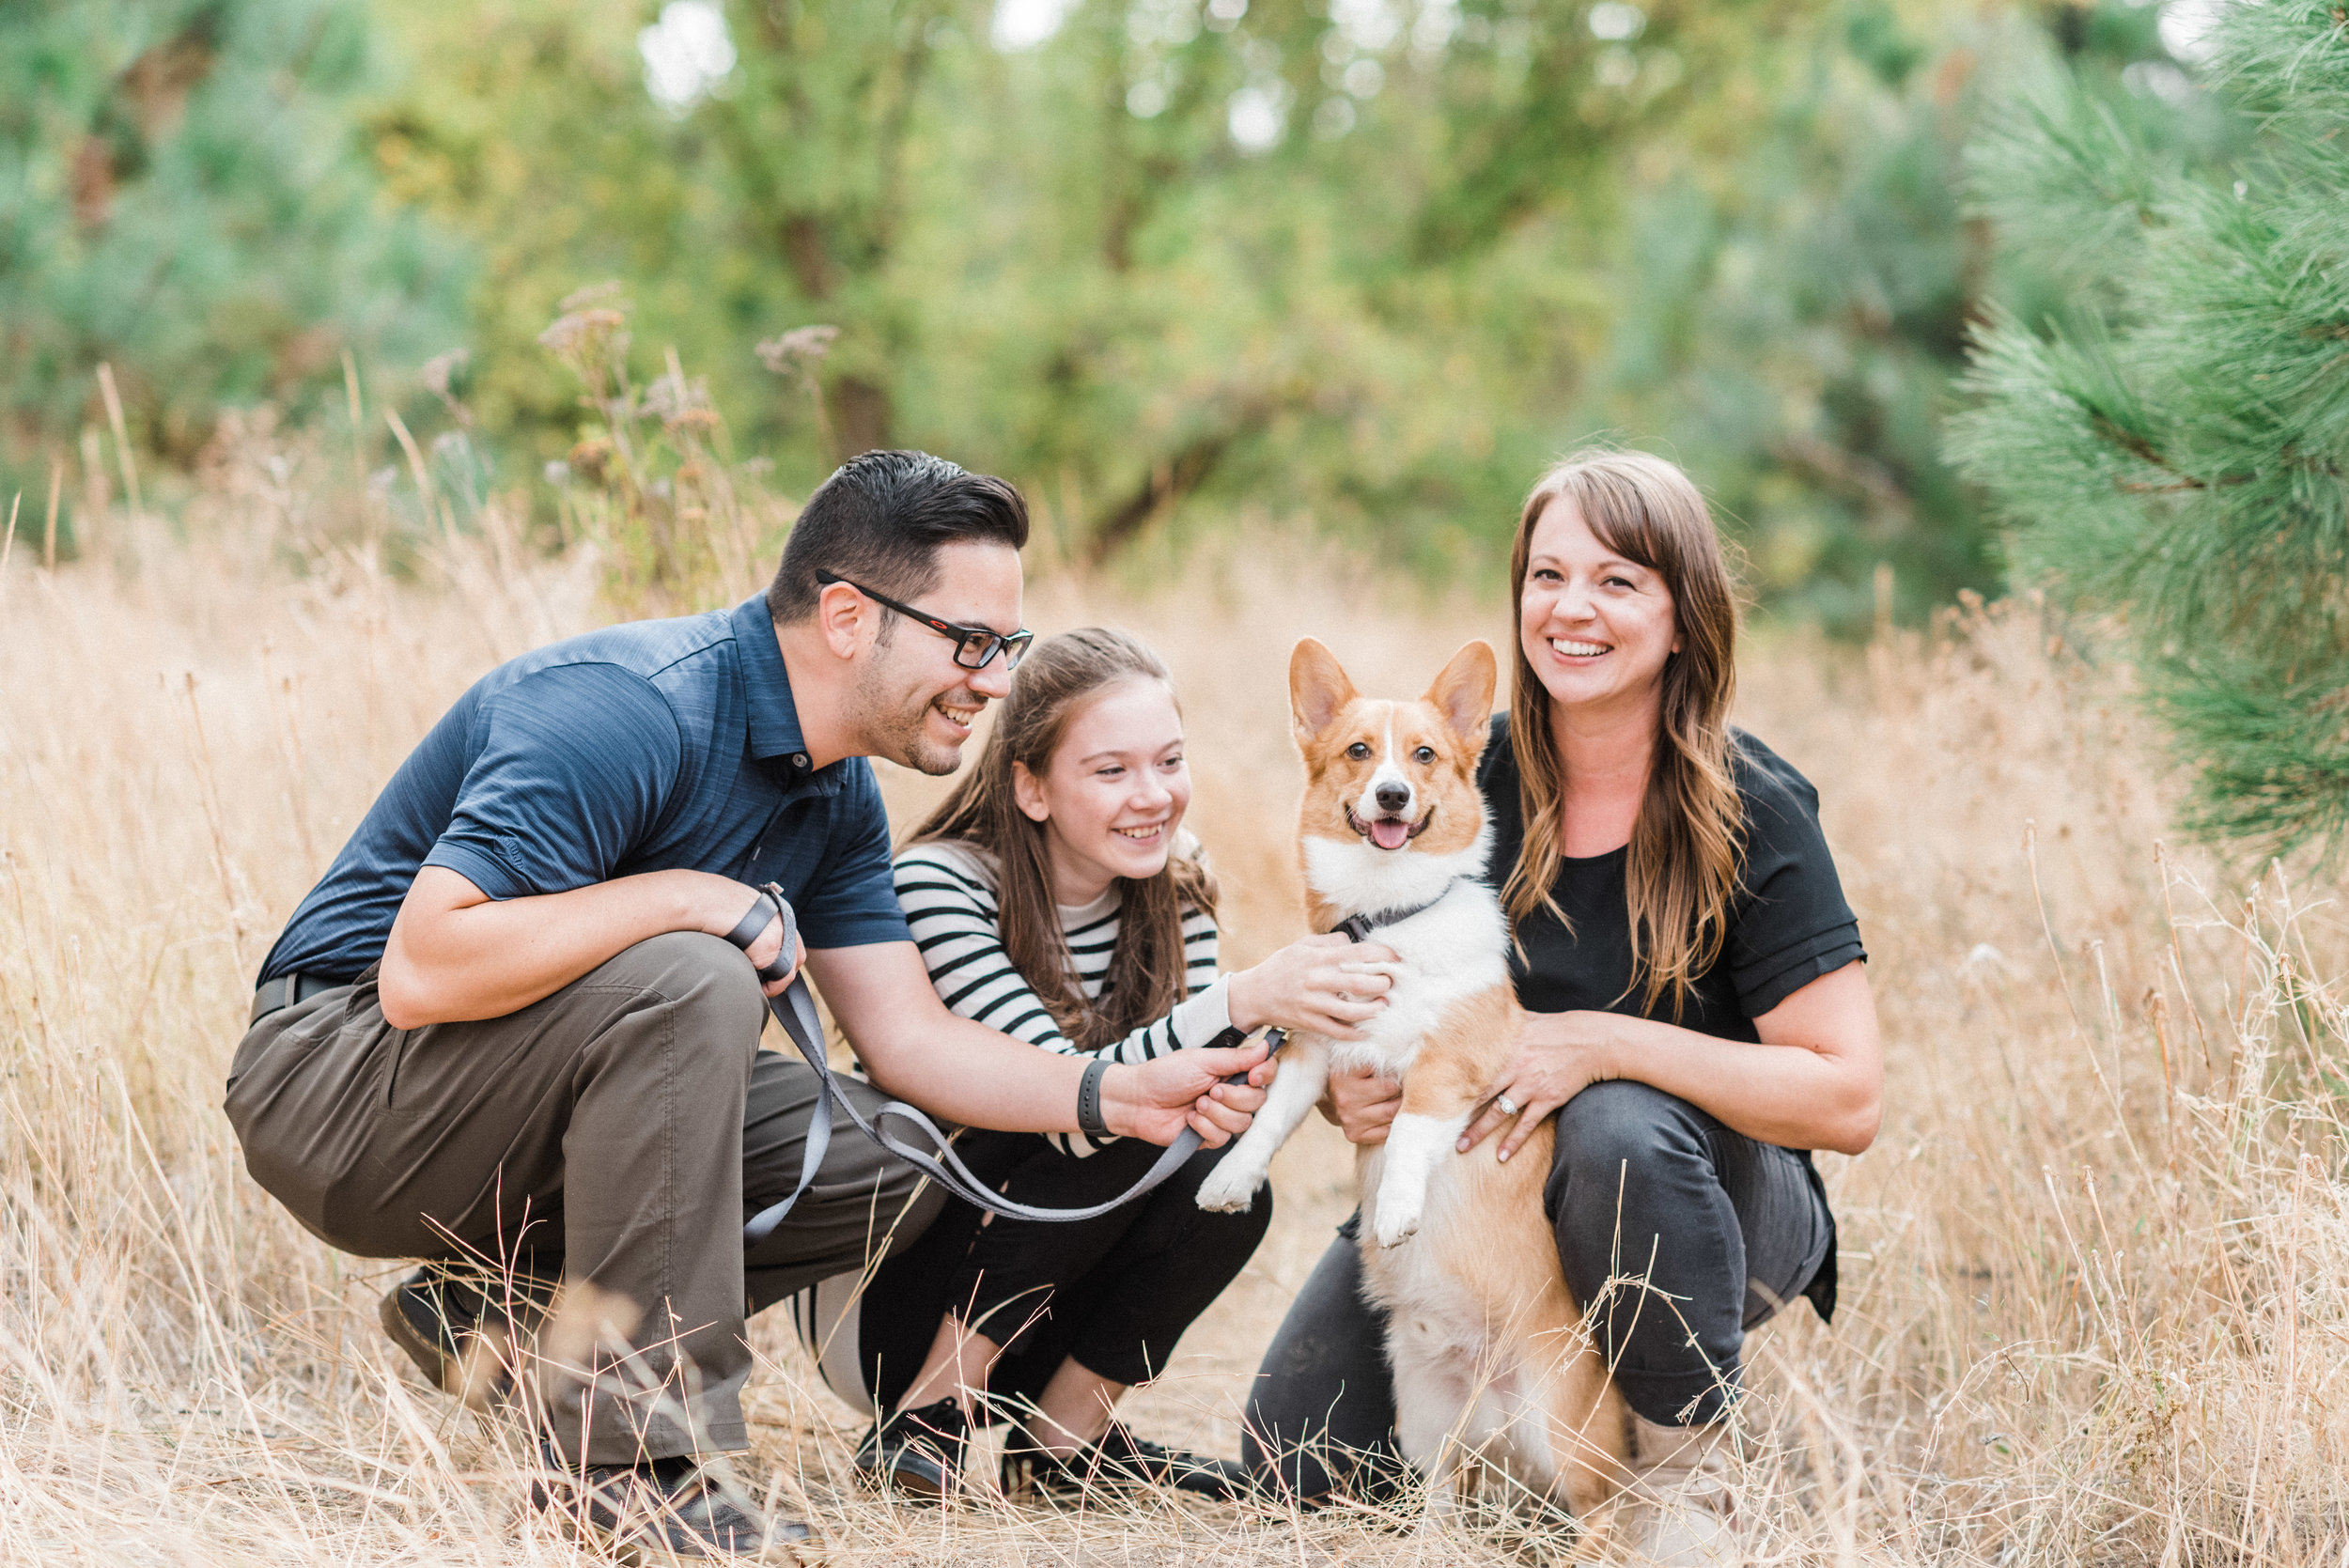 spokane_fall_family_photography_session (23 of 27).jpg